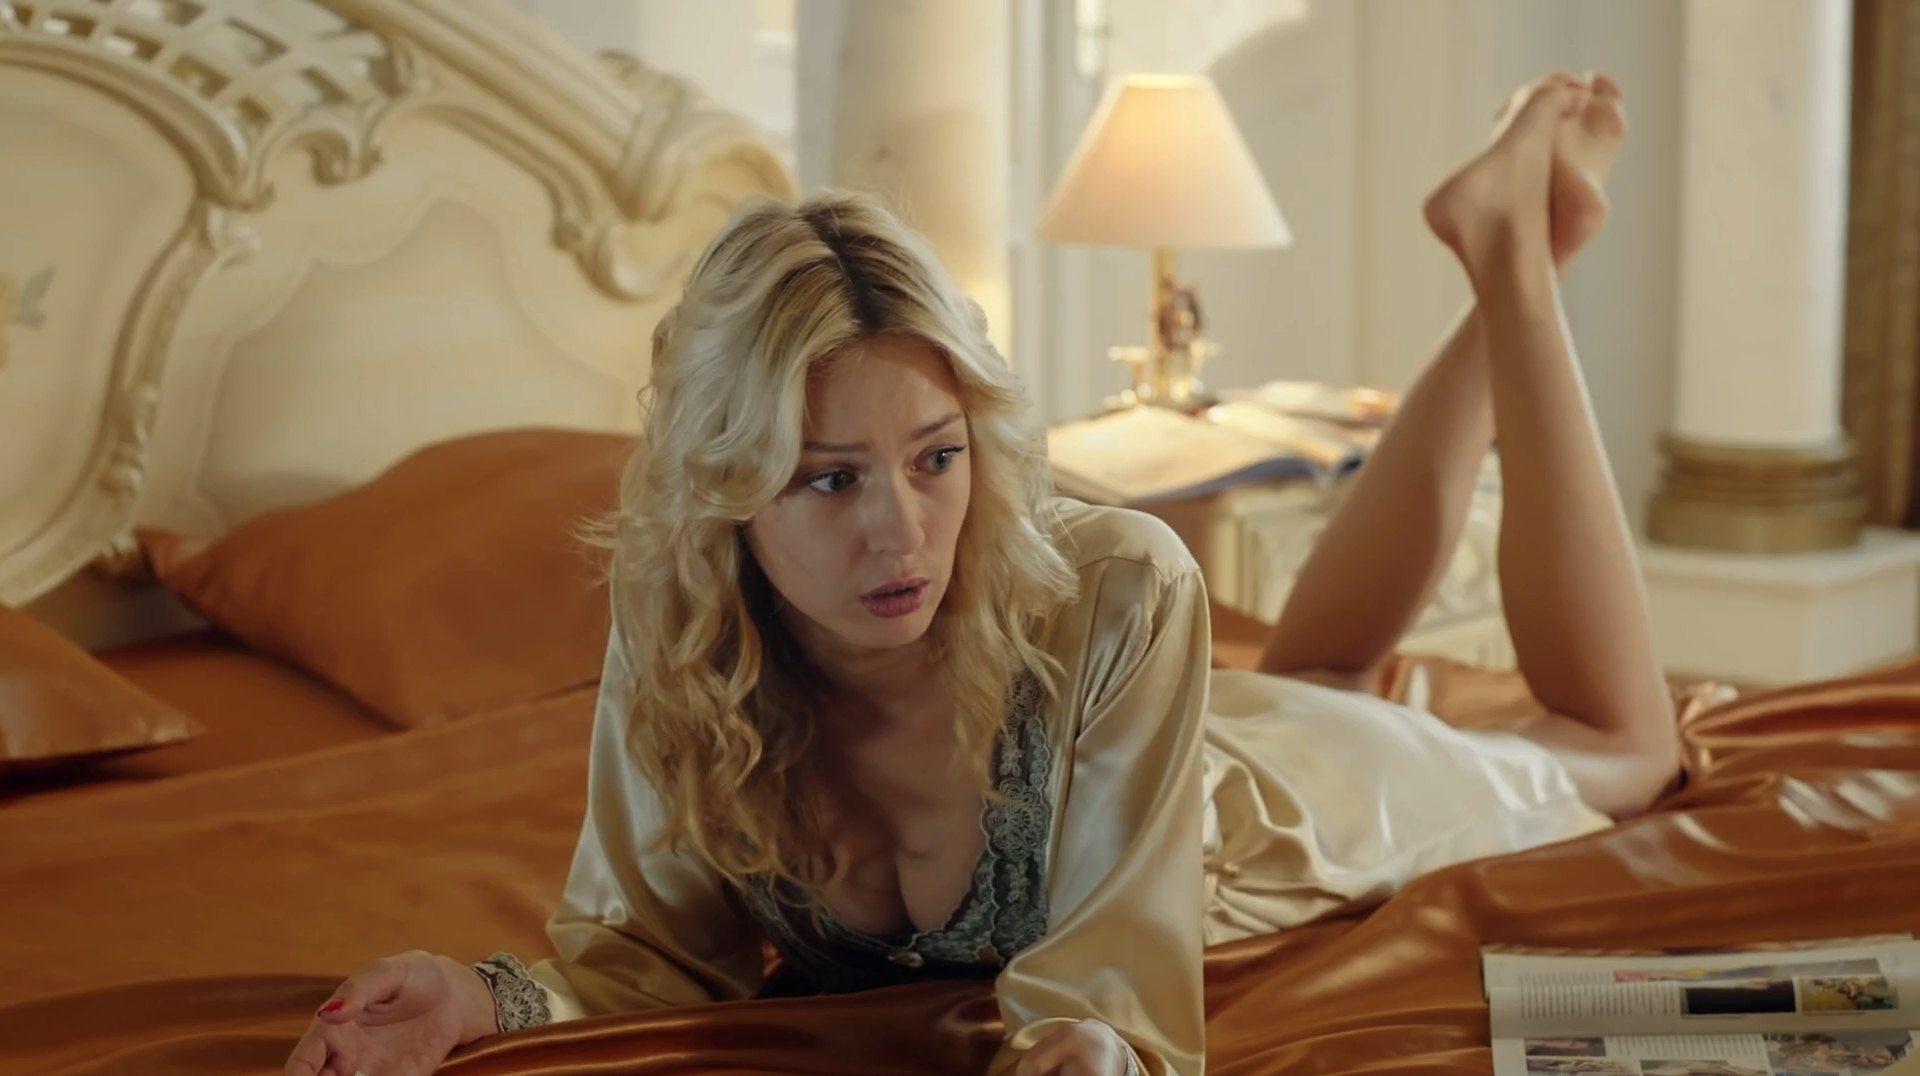 ekaterina-loza-aktrisa-porno-doveli-tolpoy-do-orgazma